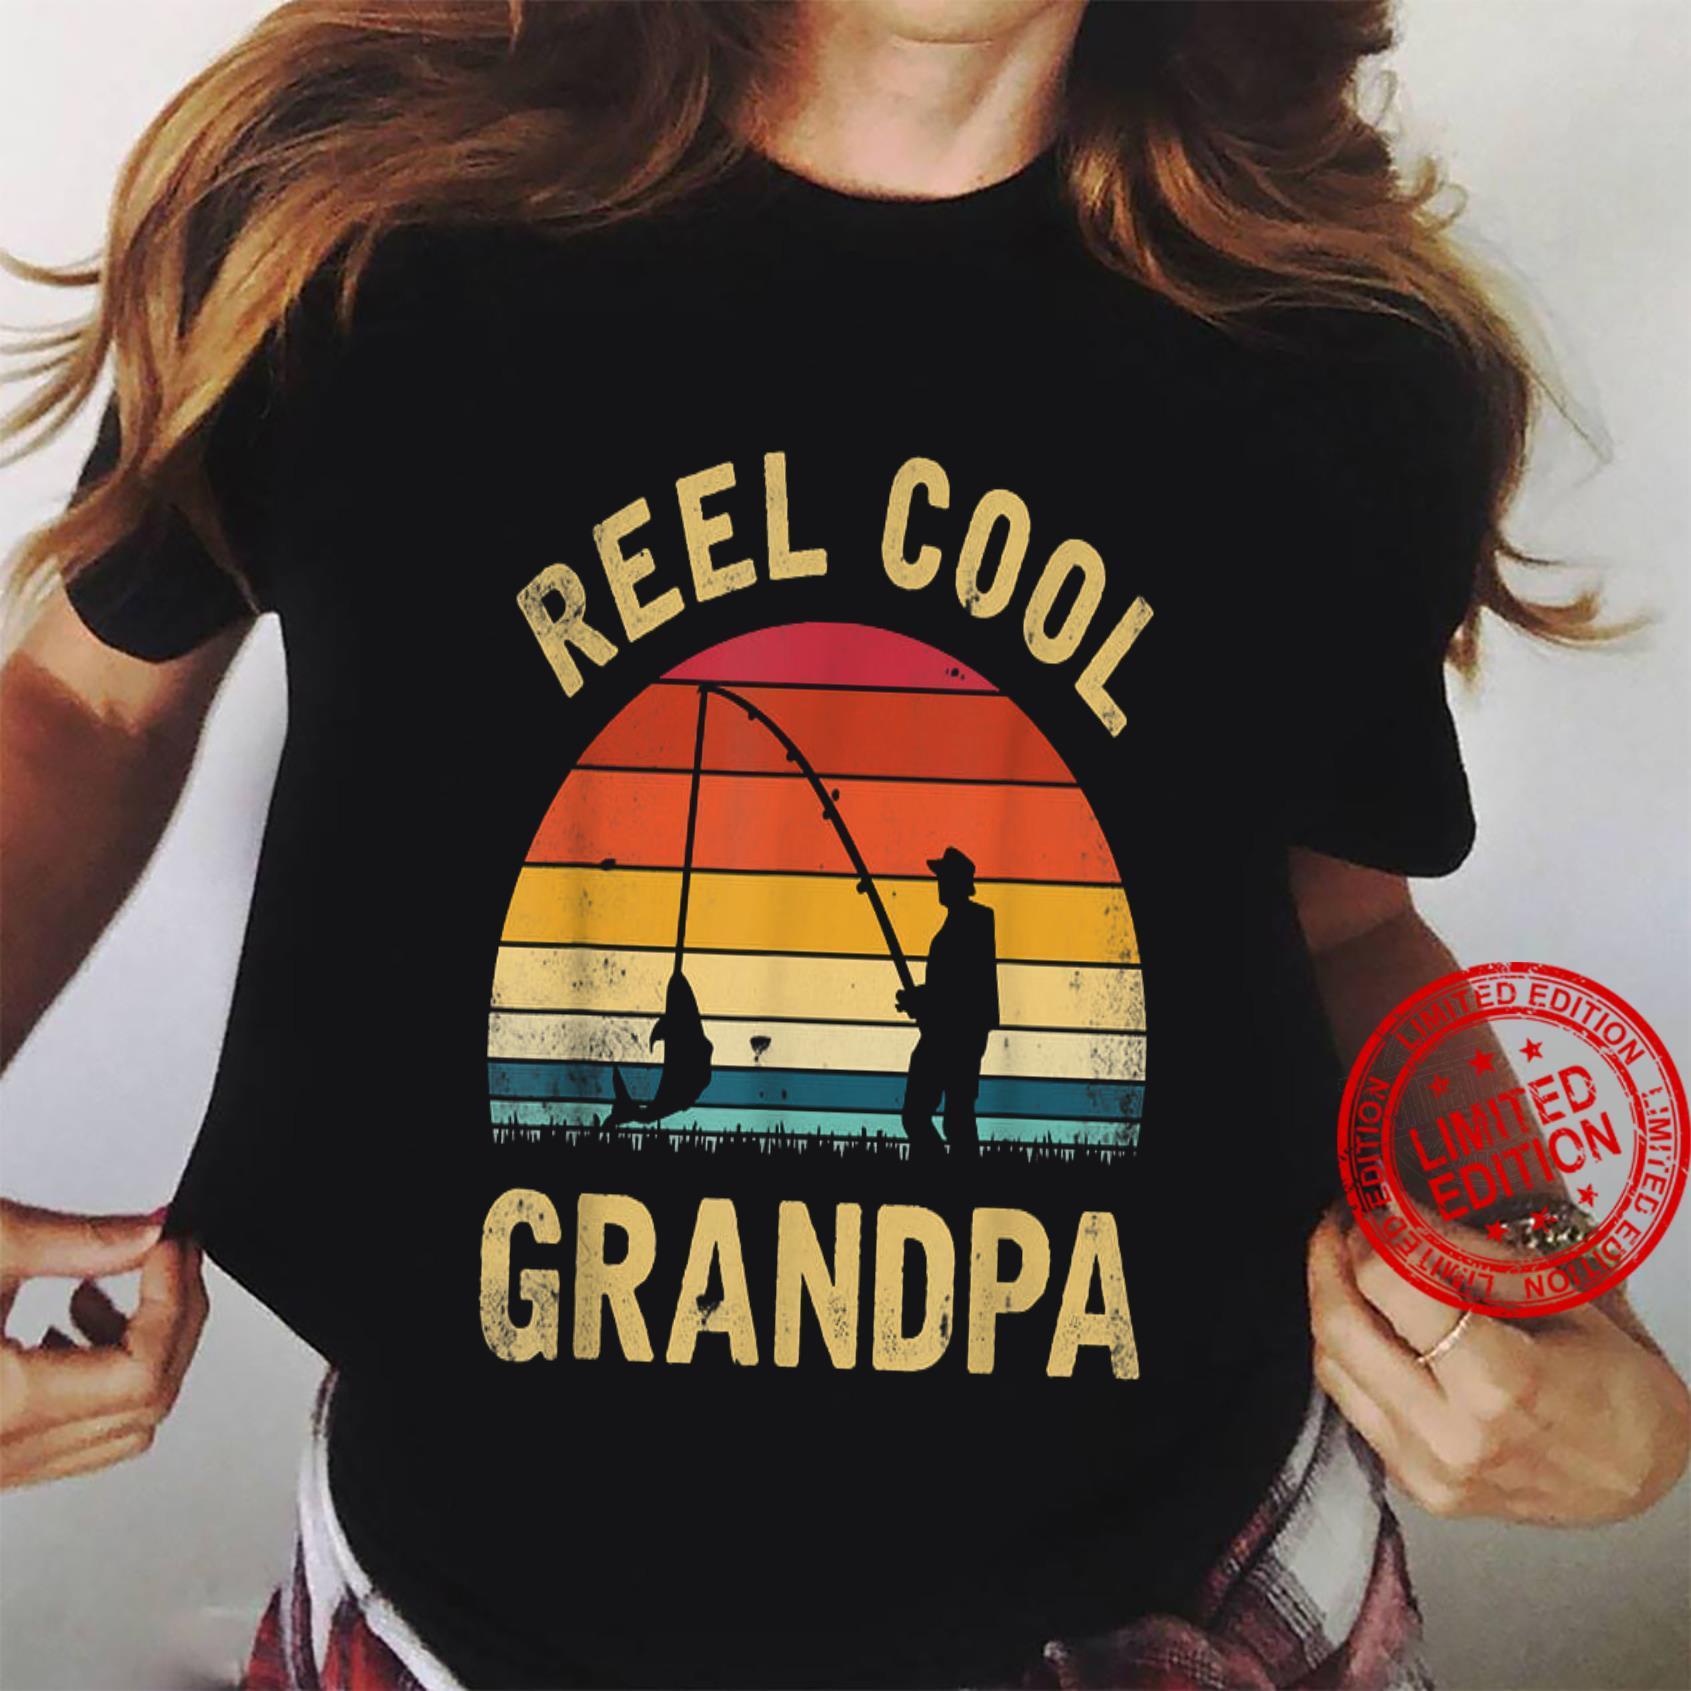 Reel Cool Grandpa Shirt ladies tee